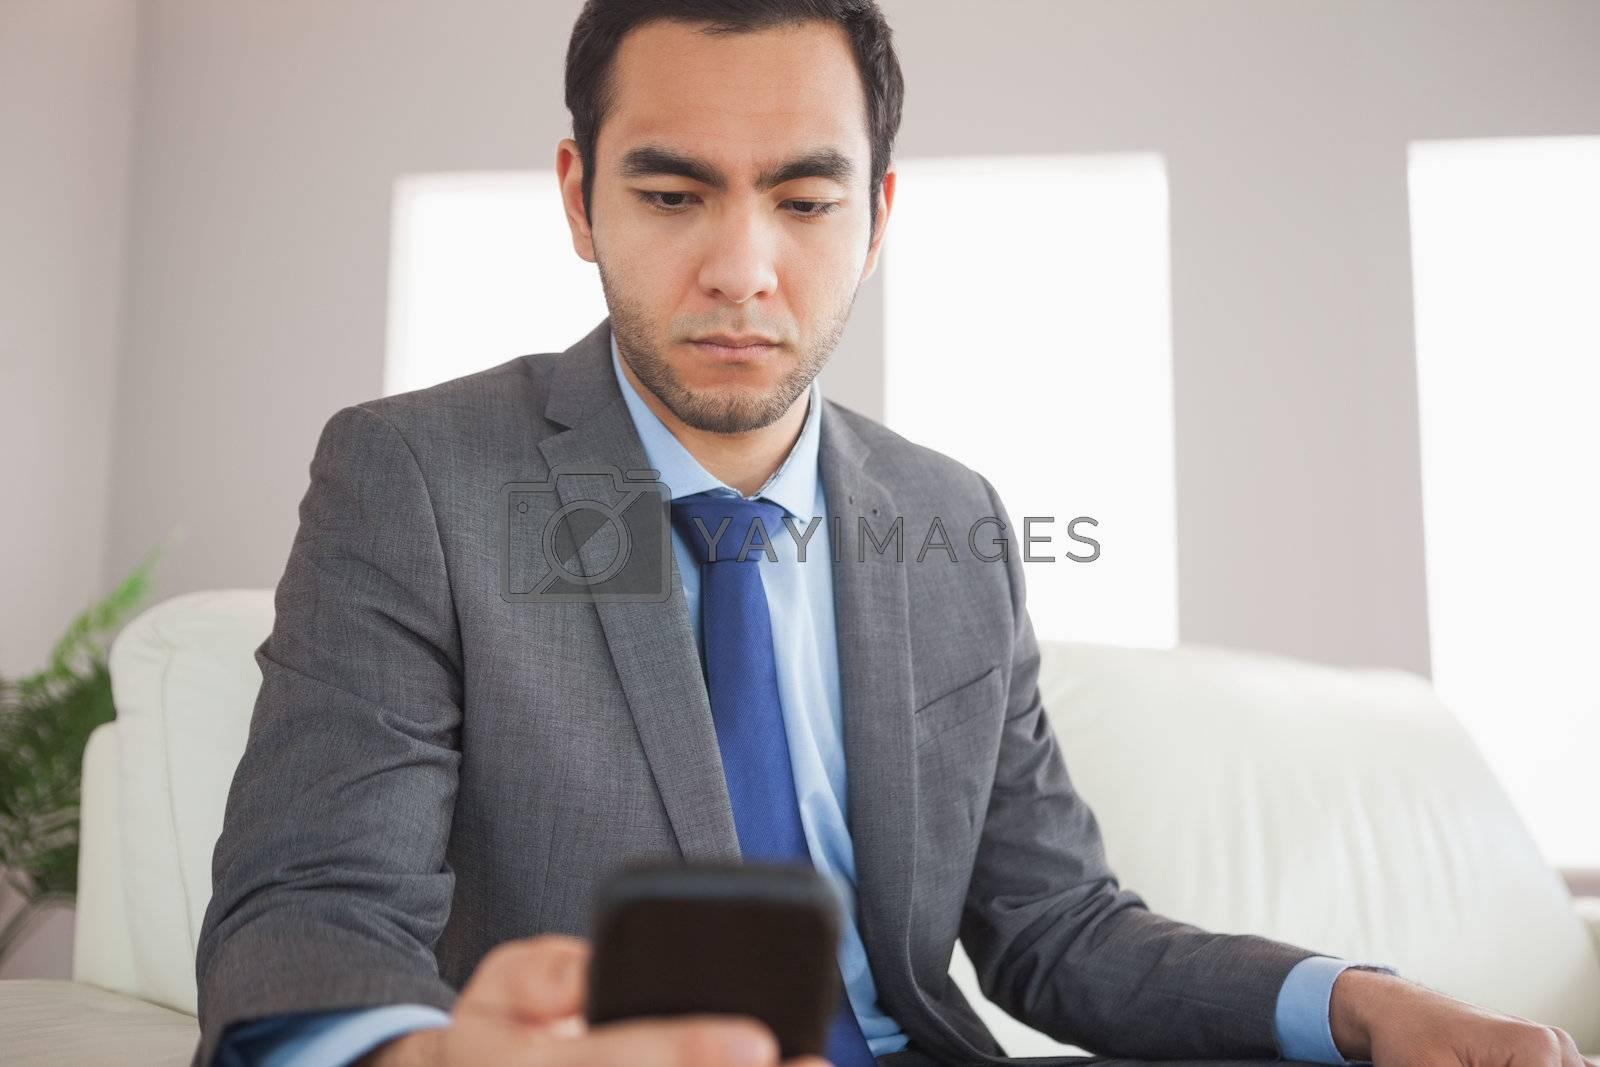 Serious businessman sending a text message by Wavebreakmedia